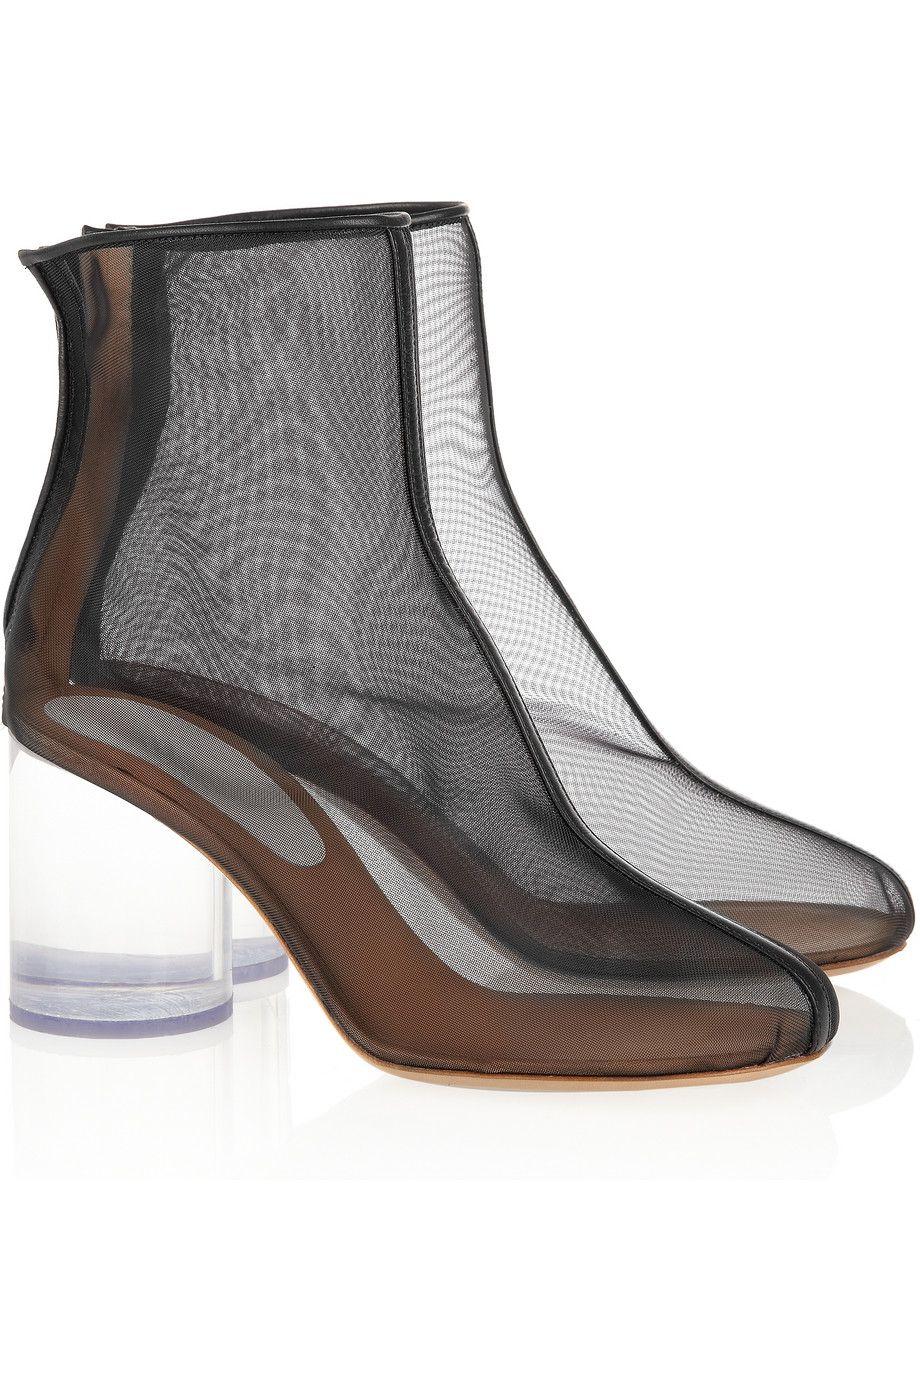 FOOTWEAR - Shoe boots Maison Martin Margiela z7OKU4zvqu